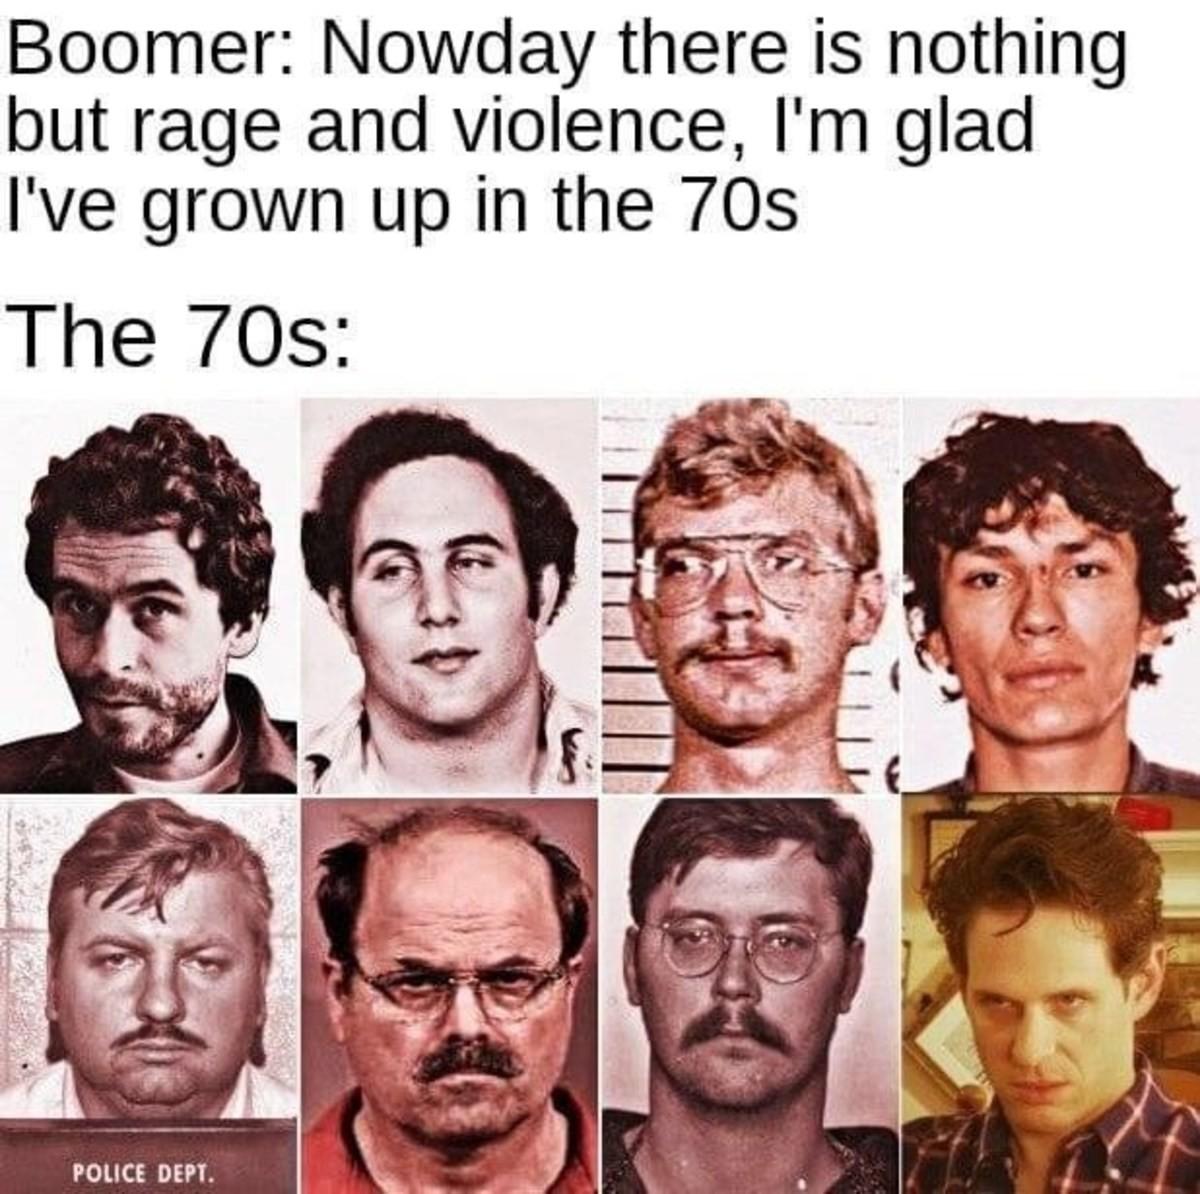 diligent reserve Rook. .. 1. Ted Bundy 2. Son of Sam 3. Jeffrey Dahmer 4. Menendez? 5. John Wayne Gacey 6. ??? 7. Ed Kemper 8. Jordan Peterson?